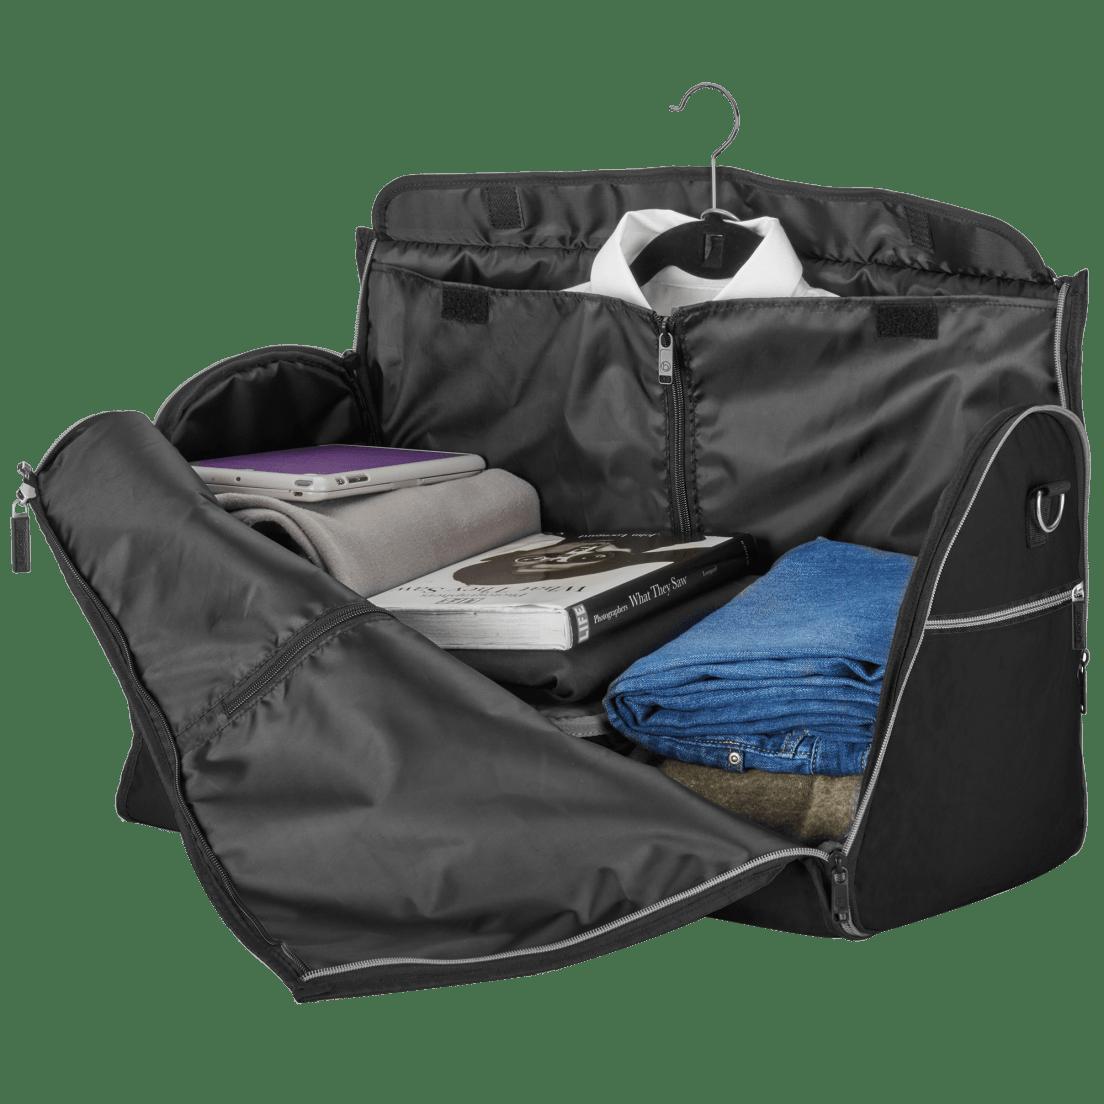 5835efbd1bbf Biaggi Hangeroo Garment Bag + Satchel